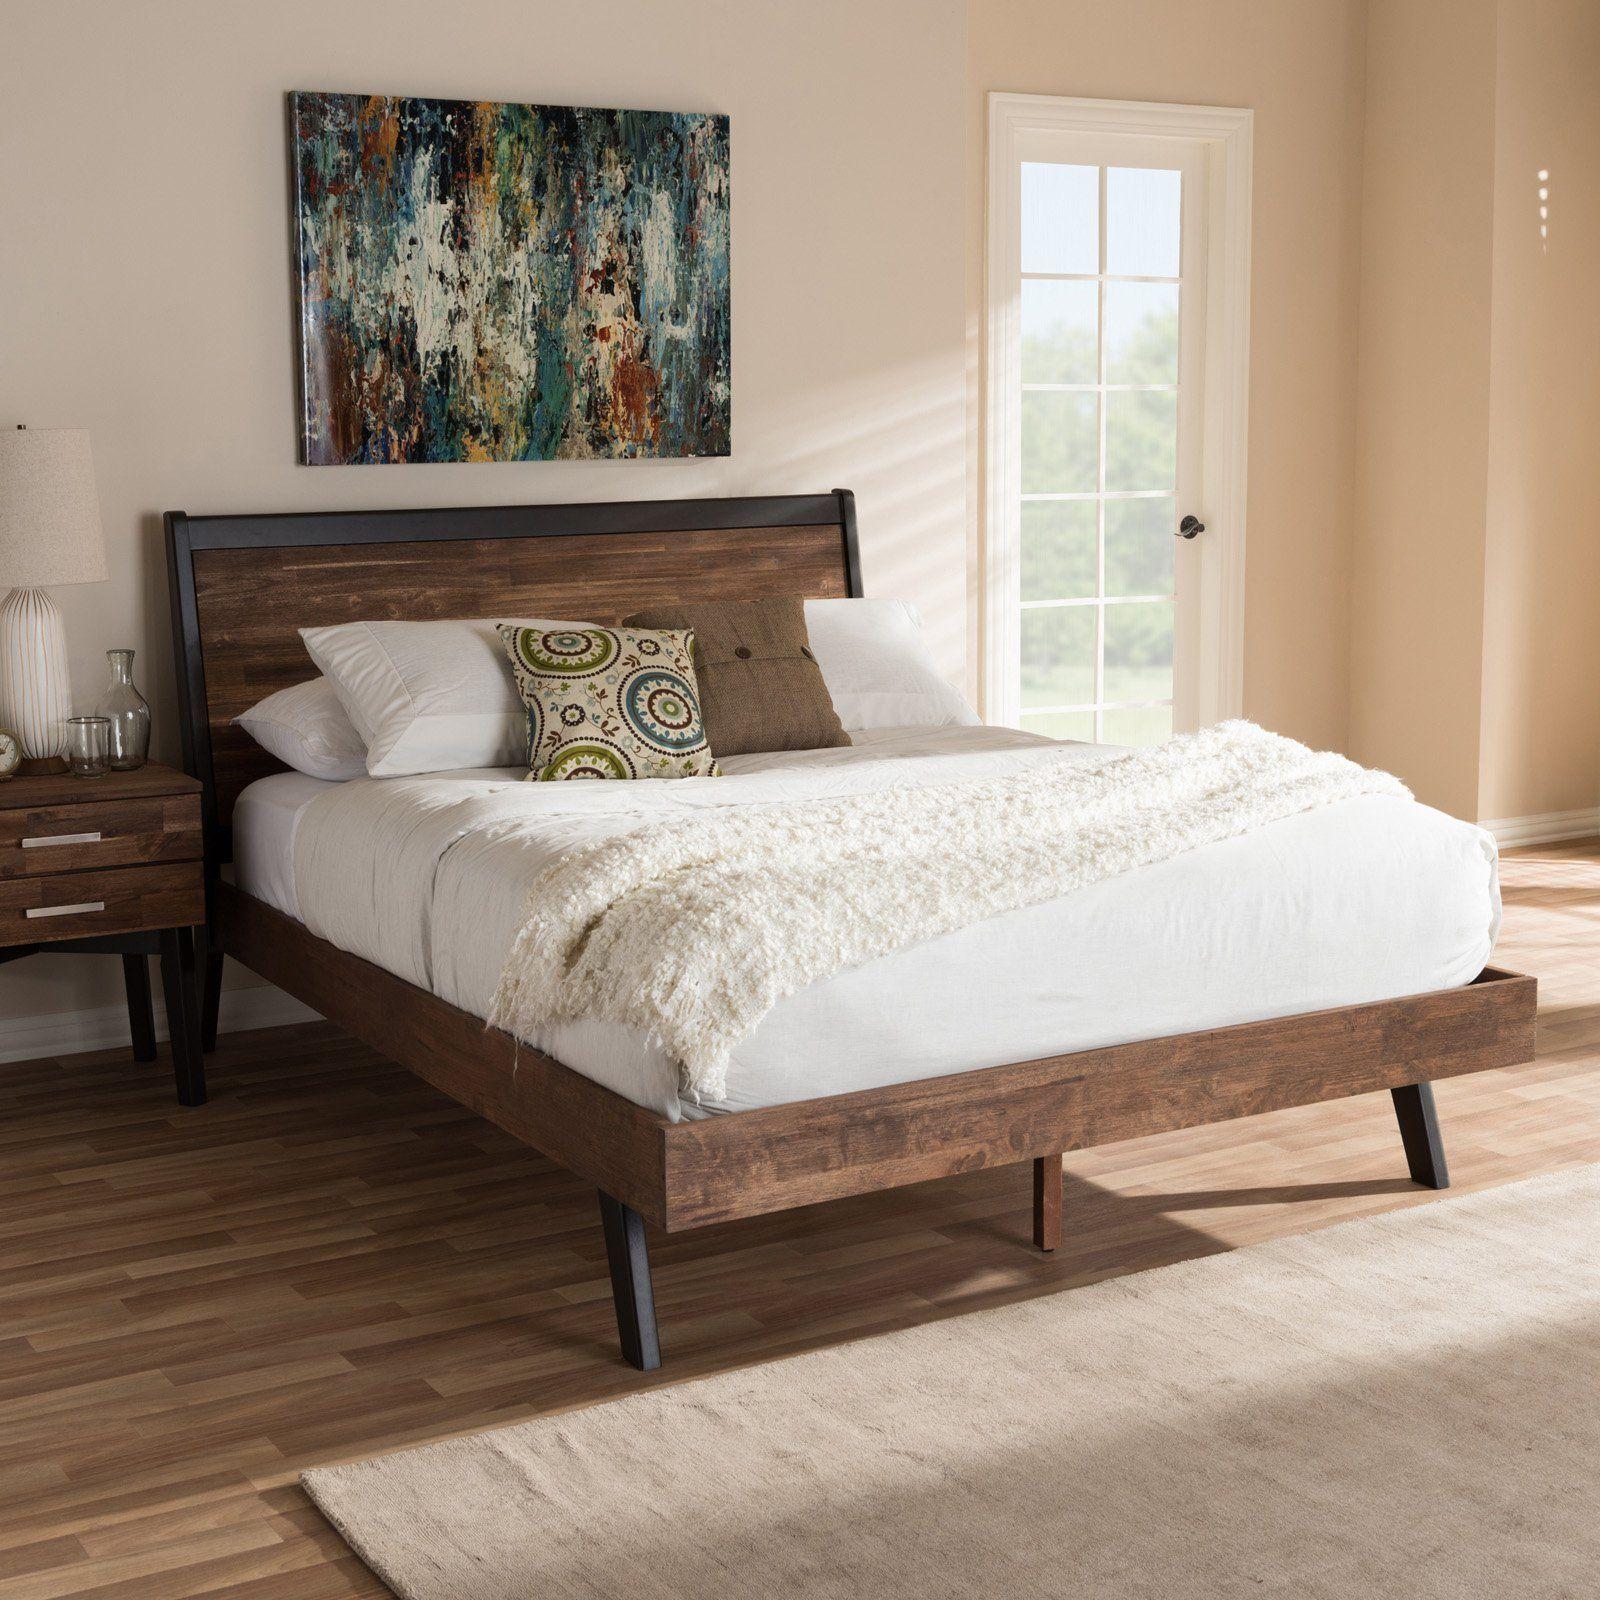 Best Baxton Studio Selena Mid Century Modern Brown Wood Queen 400 x 300